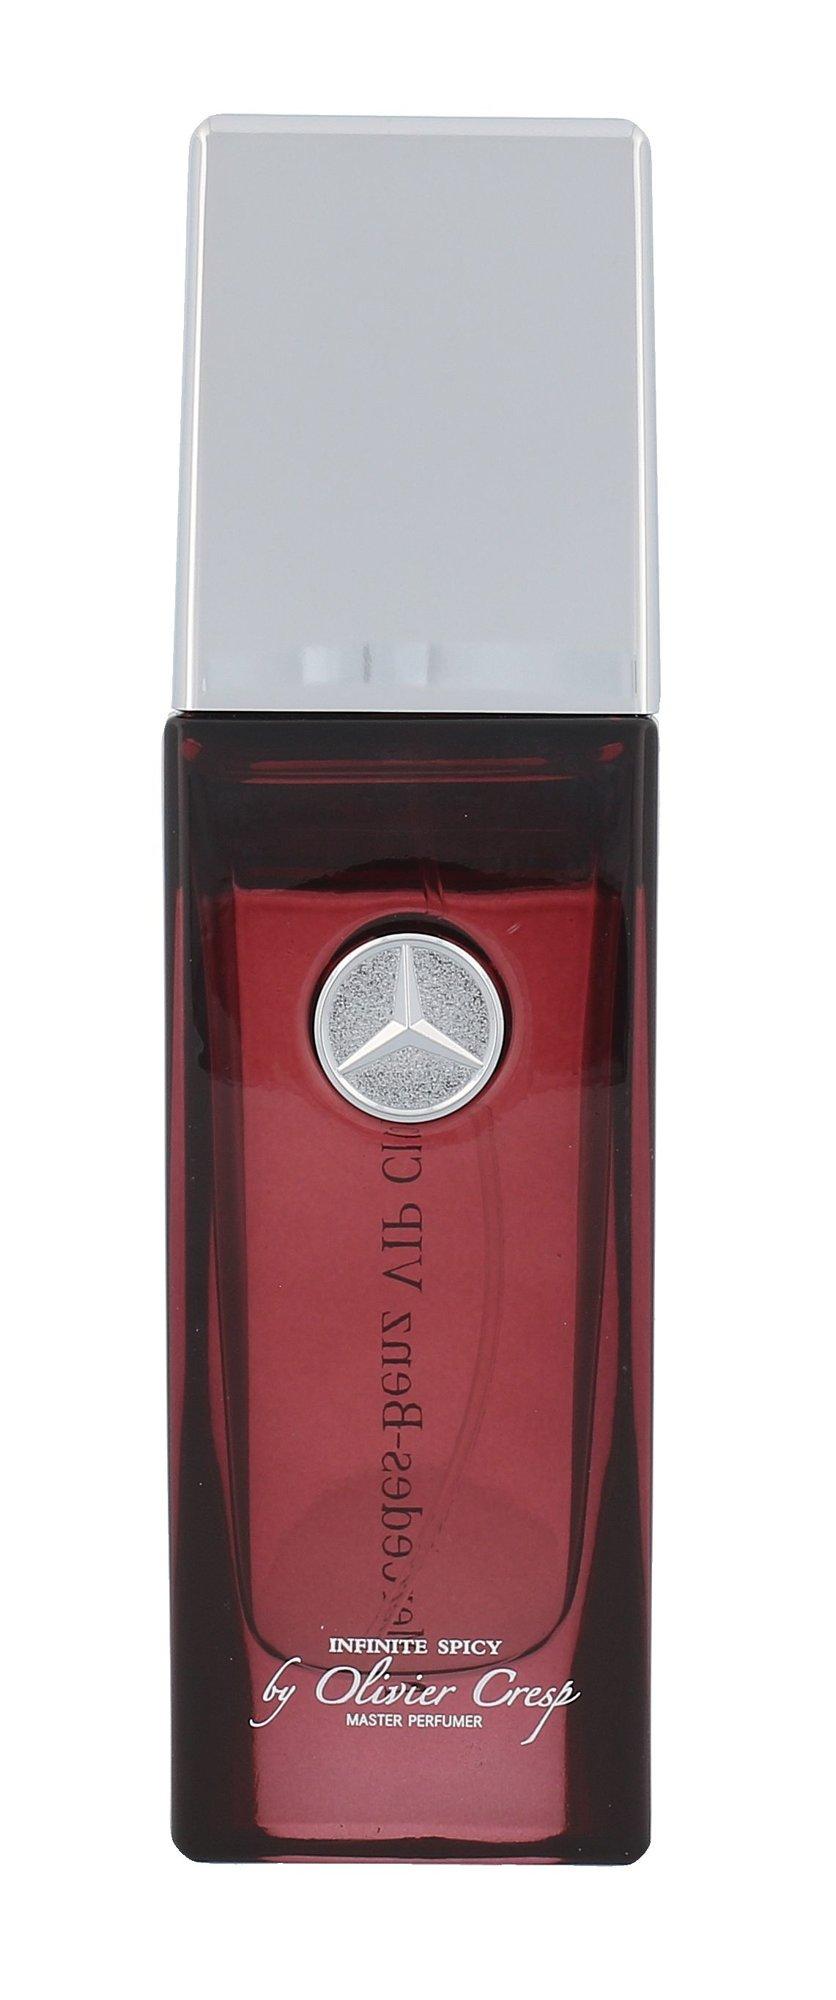 Mercedes-Benz Vip Club Infinite Spicy by Olivier Cresp Eau de Toilette 50ml